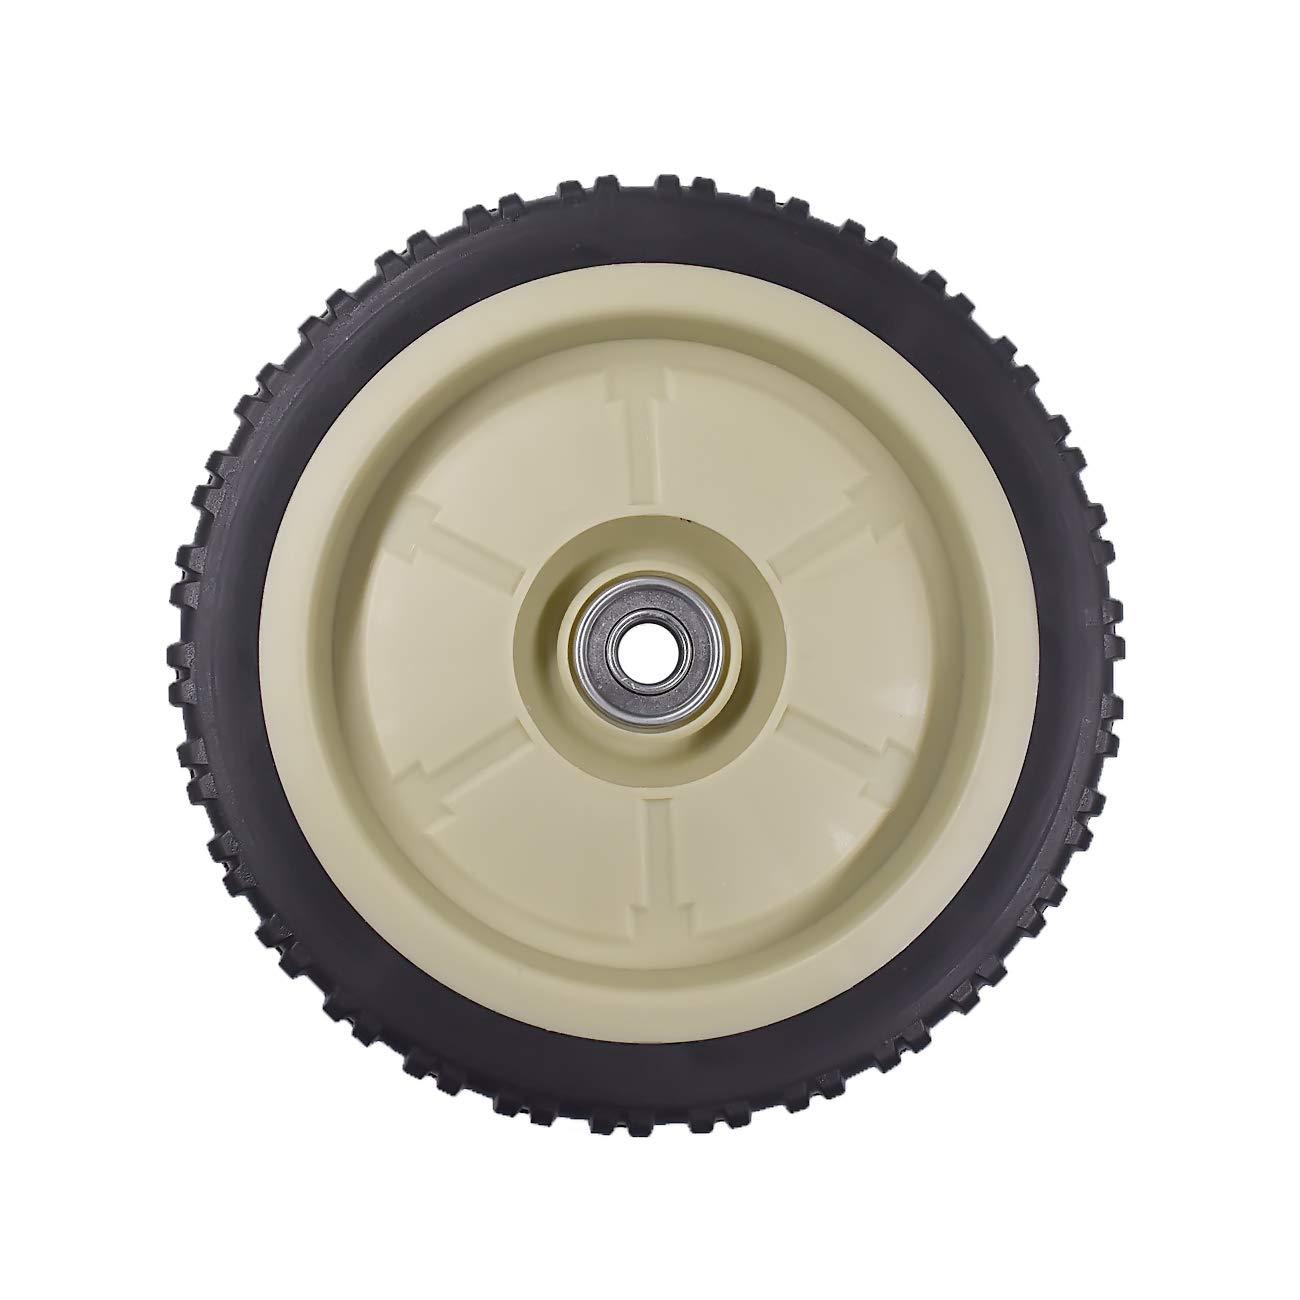 Ruichang Craftsman Rasenm/äher 20,3 x 4,4 cm Hinterrad selbstfahrend